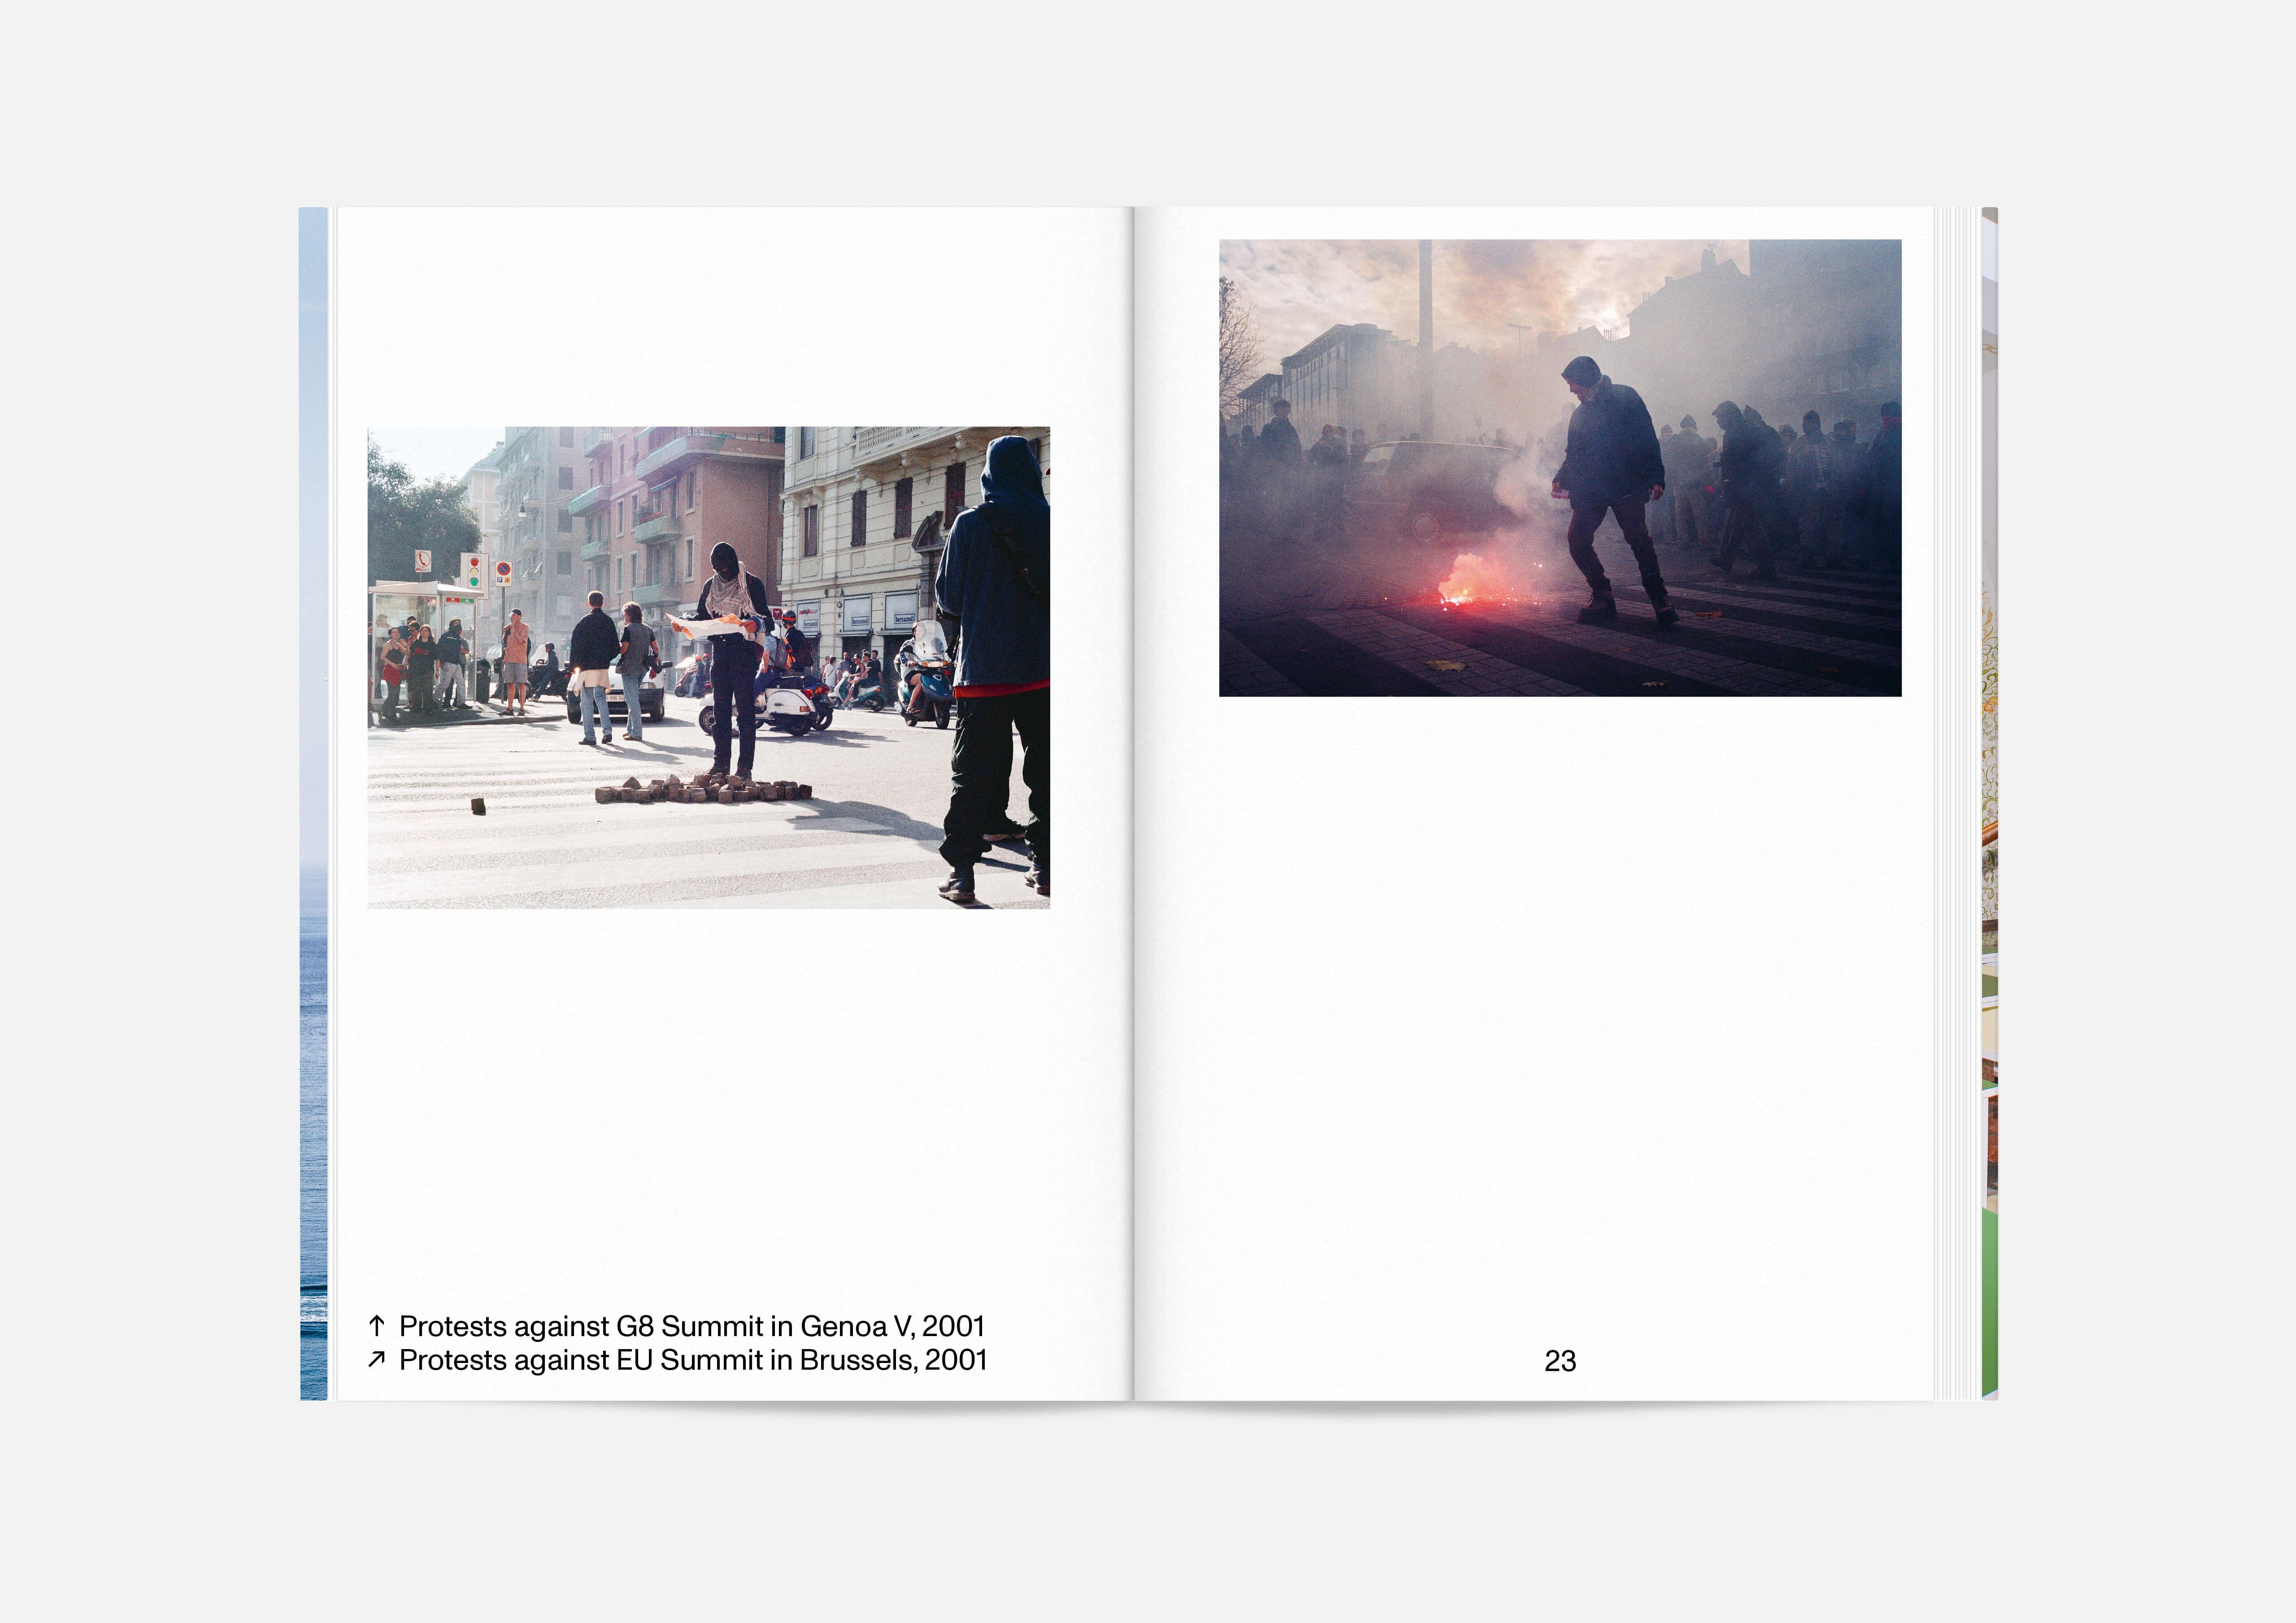 https://neuegestaltung.de/media/pages/clients/julian-roeder/d1d45773fc-1610896614/jr-glauben_07.jpg